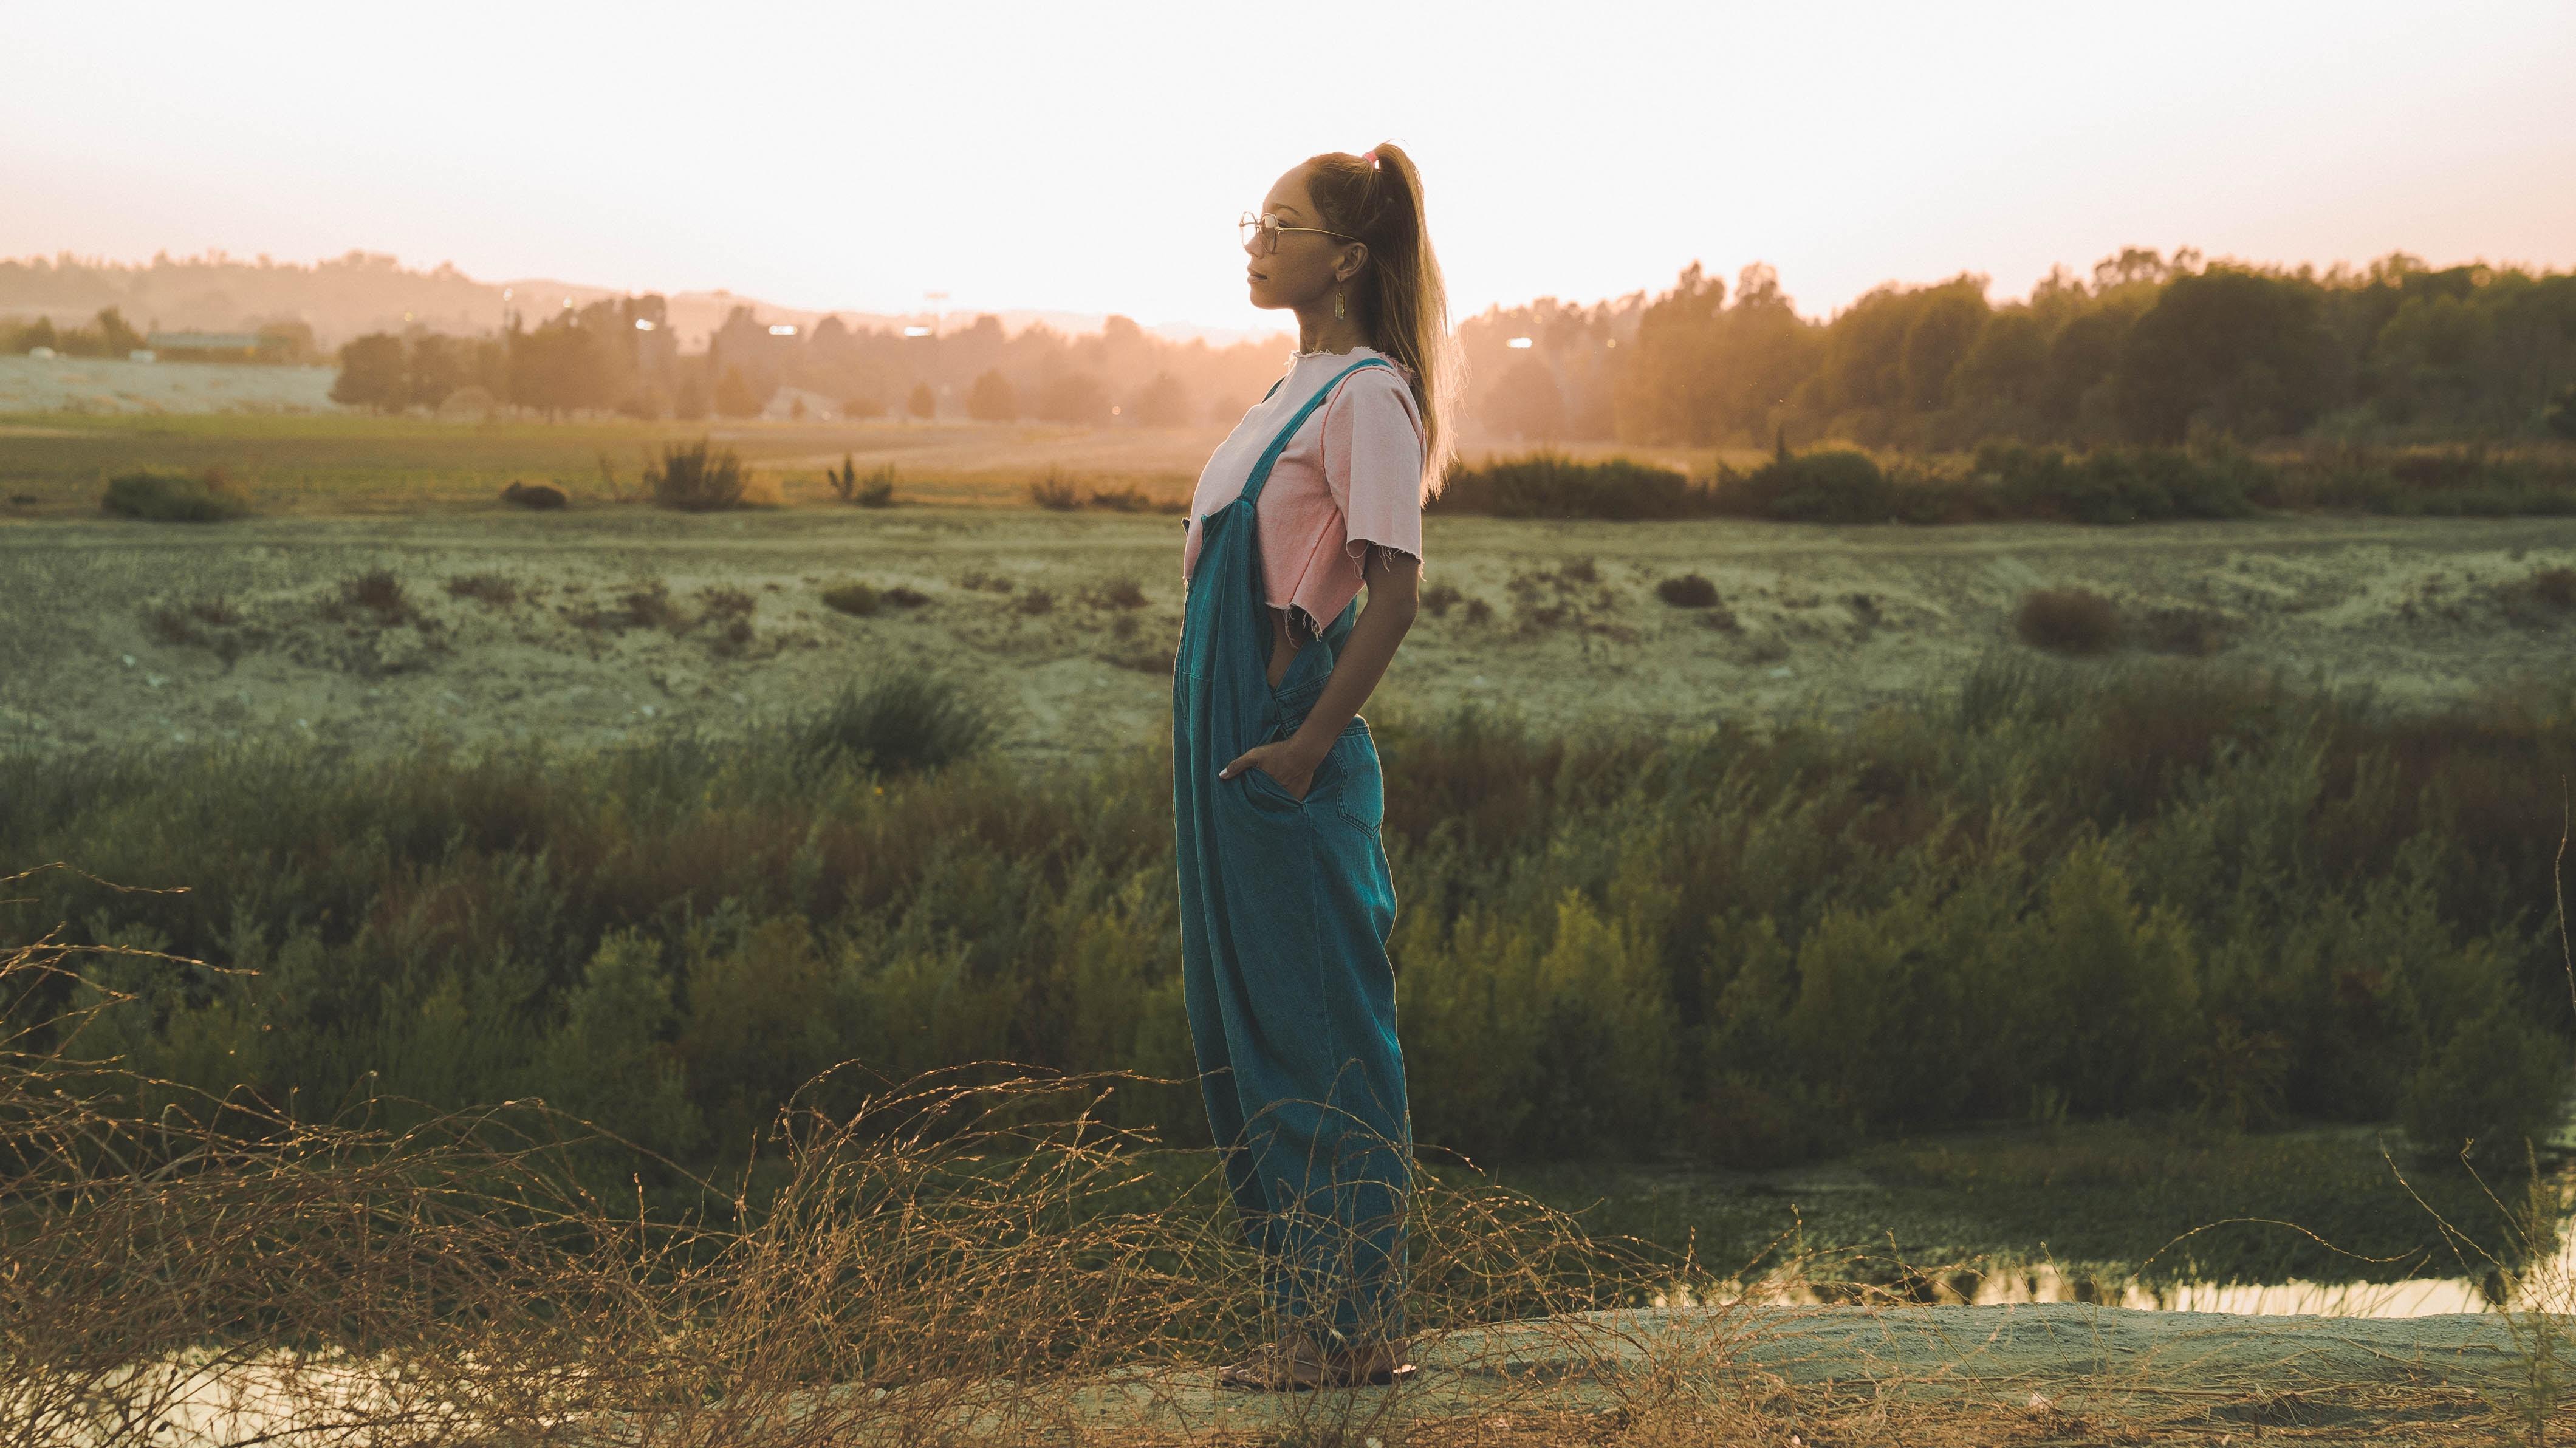 woman in green jumper standing near grass field